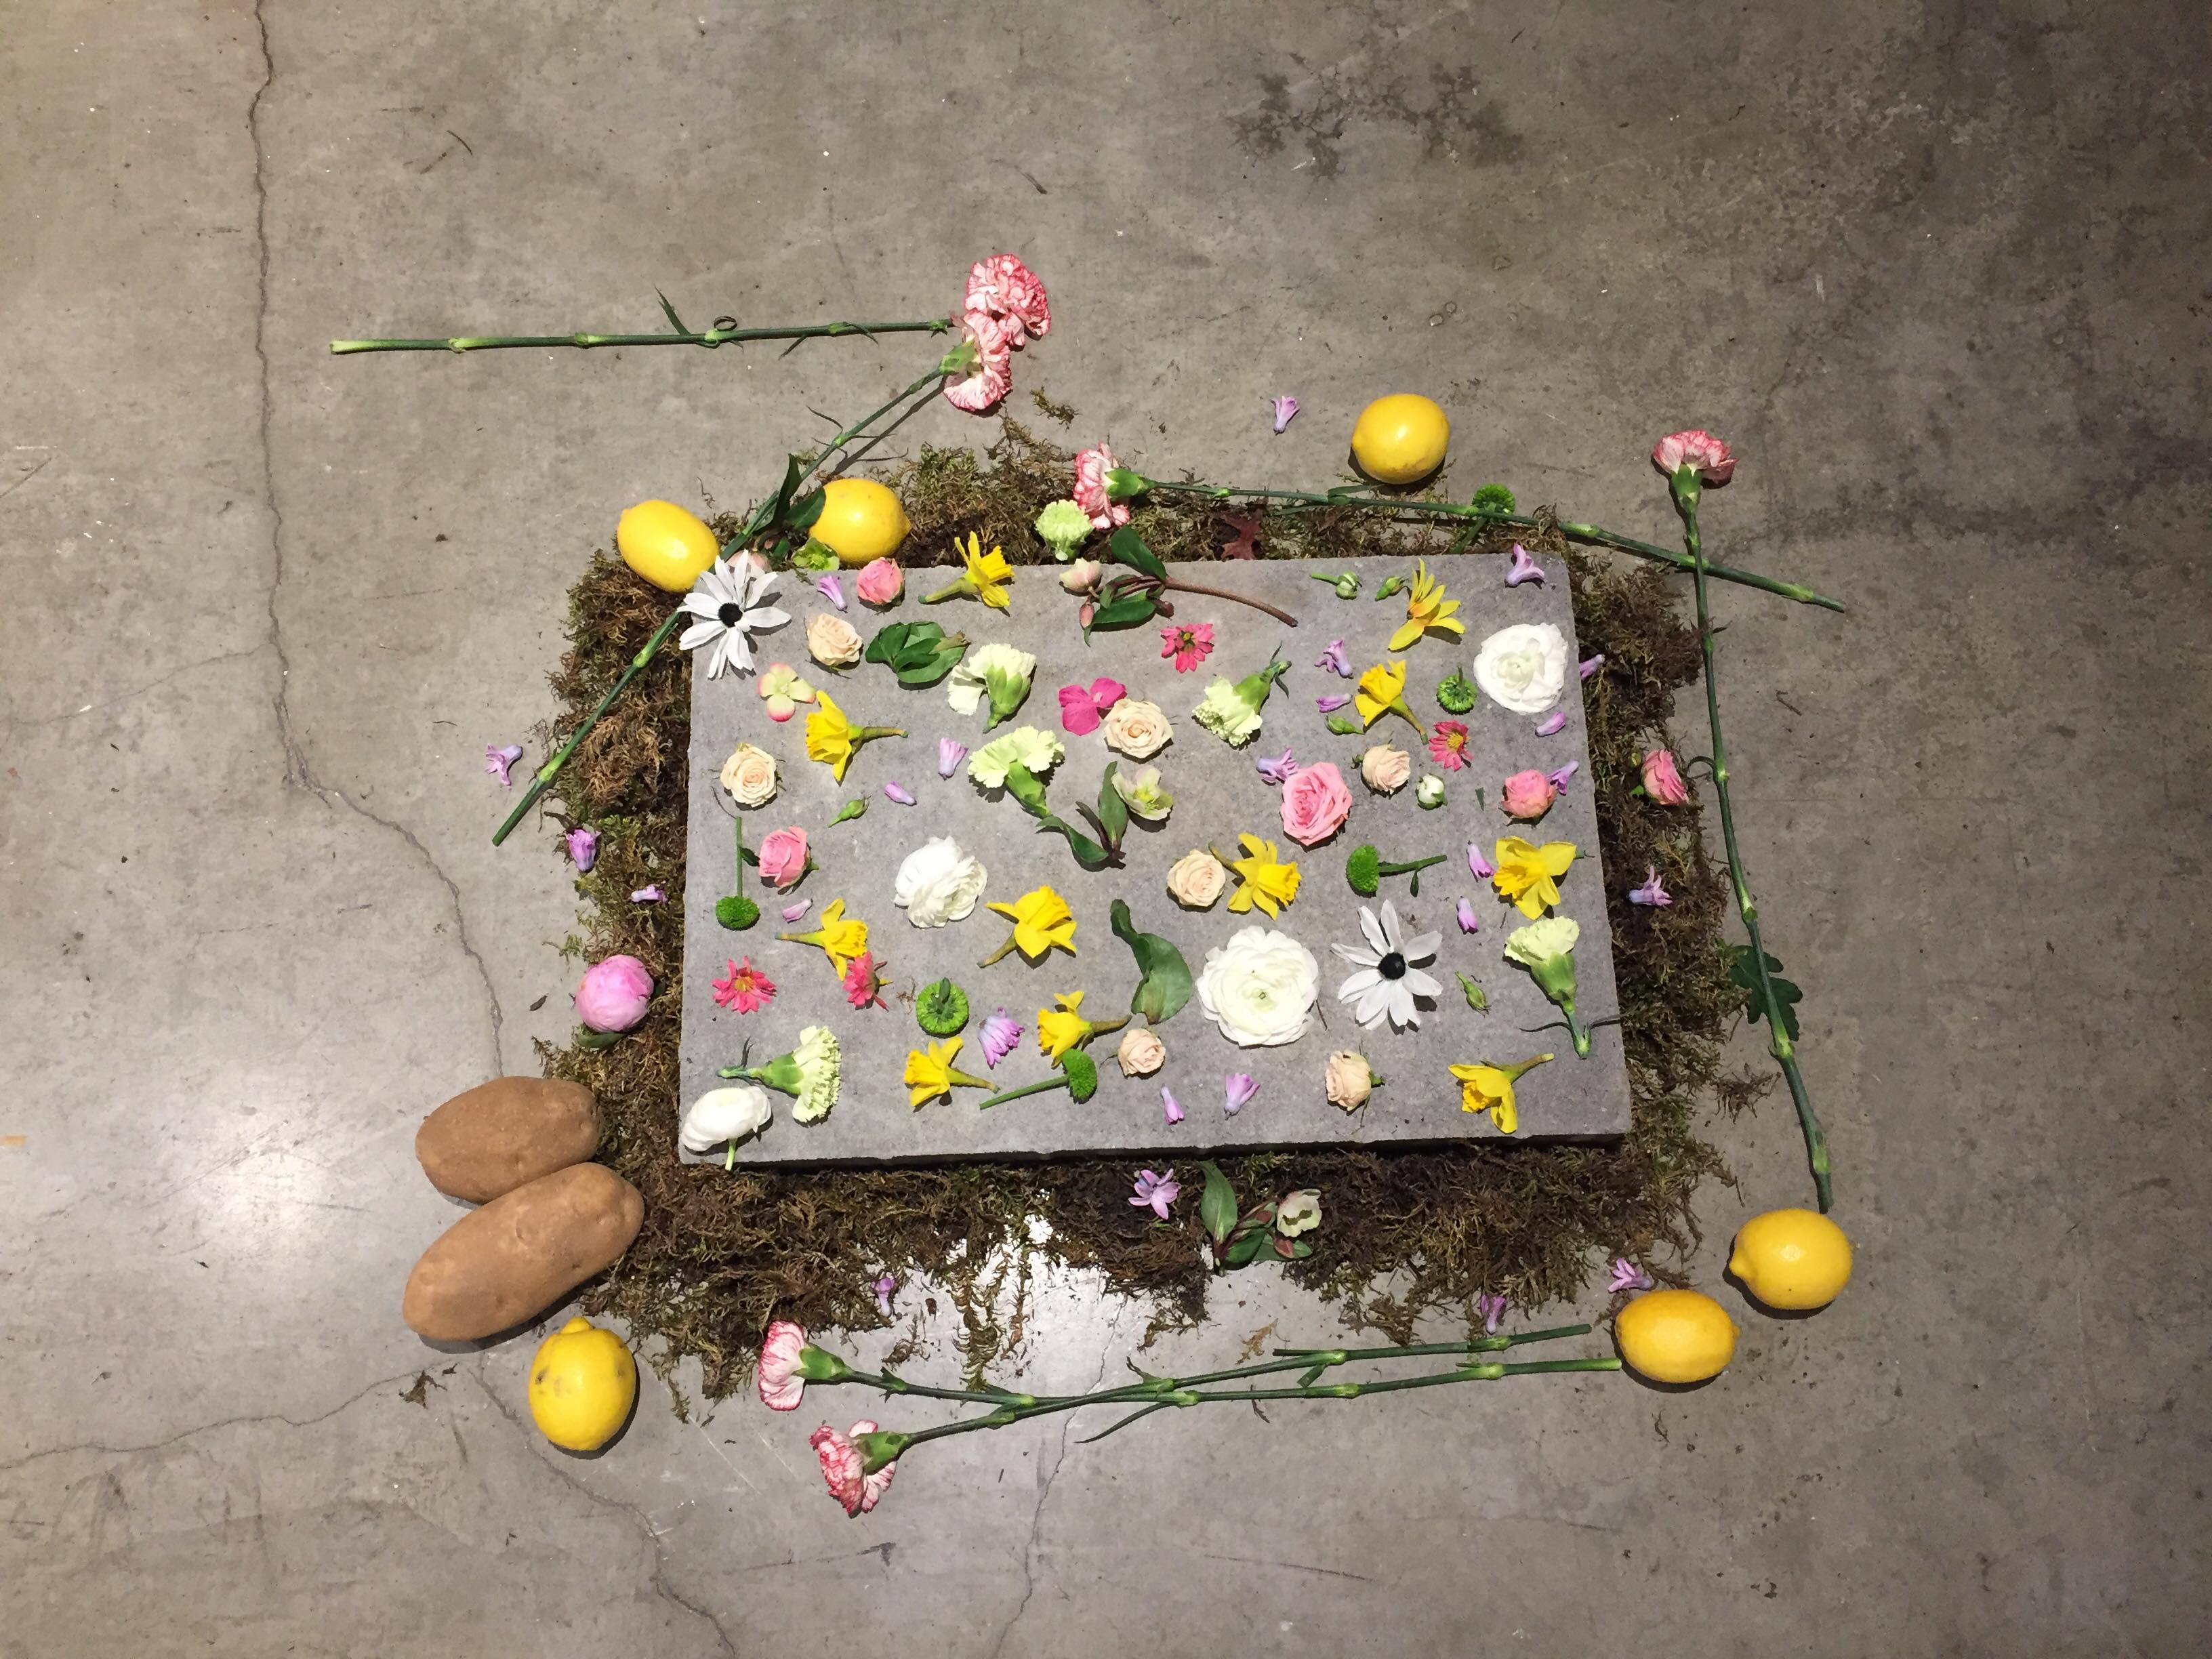 Photo: Mitra Kazemi, Ghost Spring installation, grunt gallery, 2018